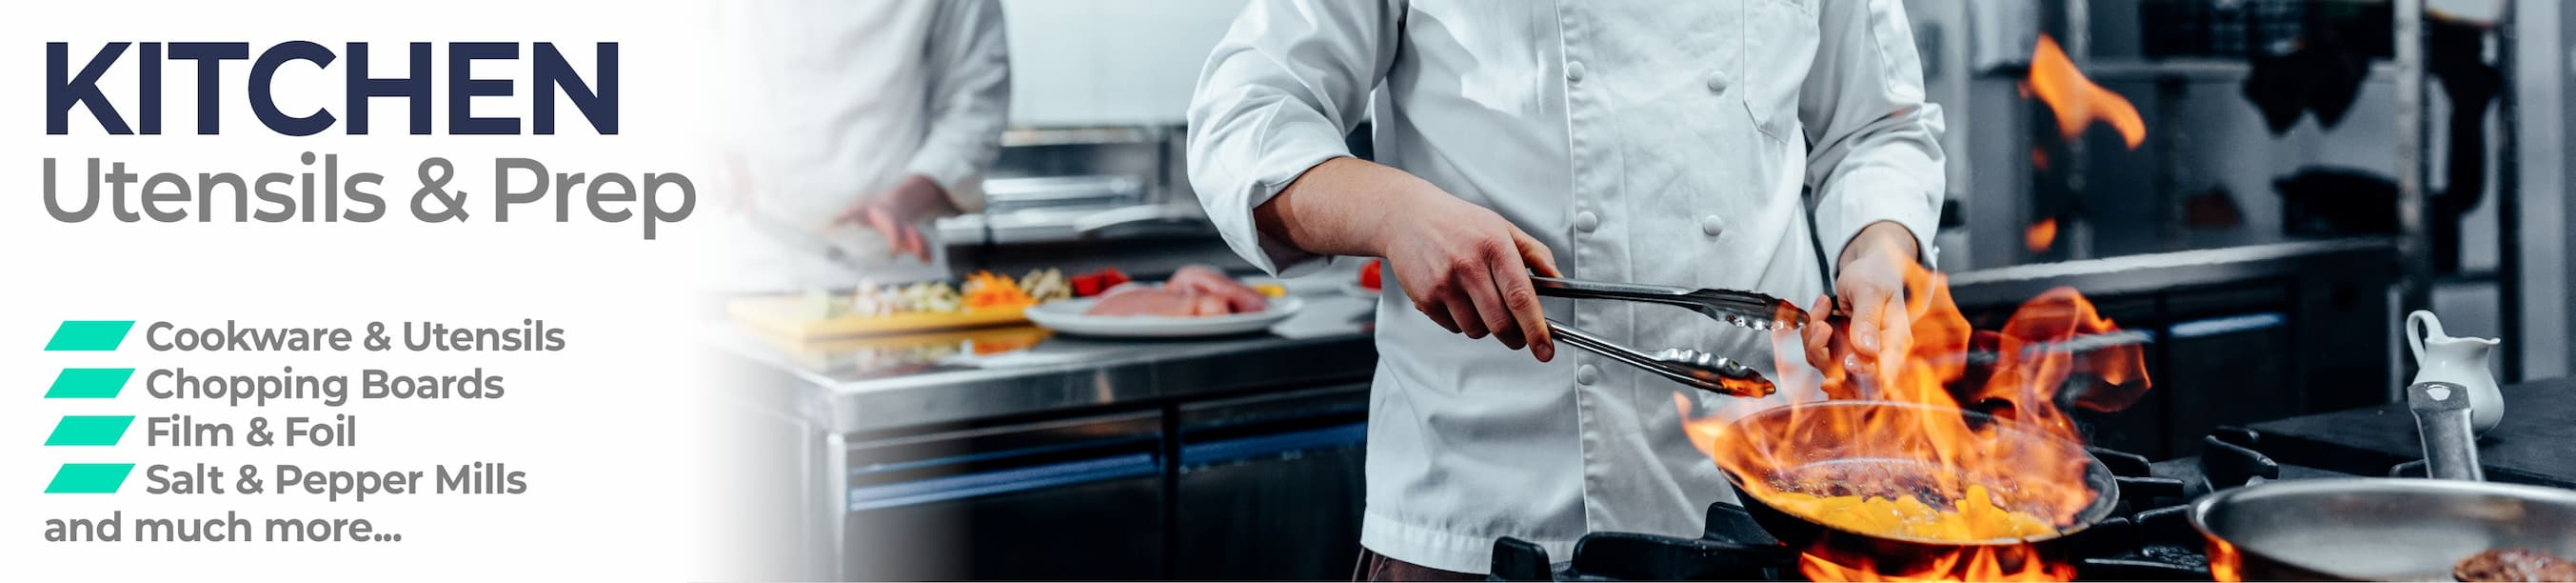 Chefs utensils